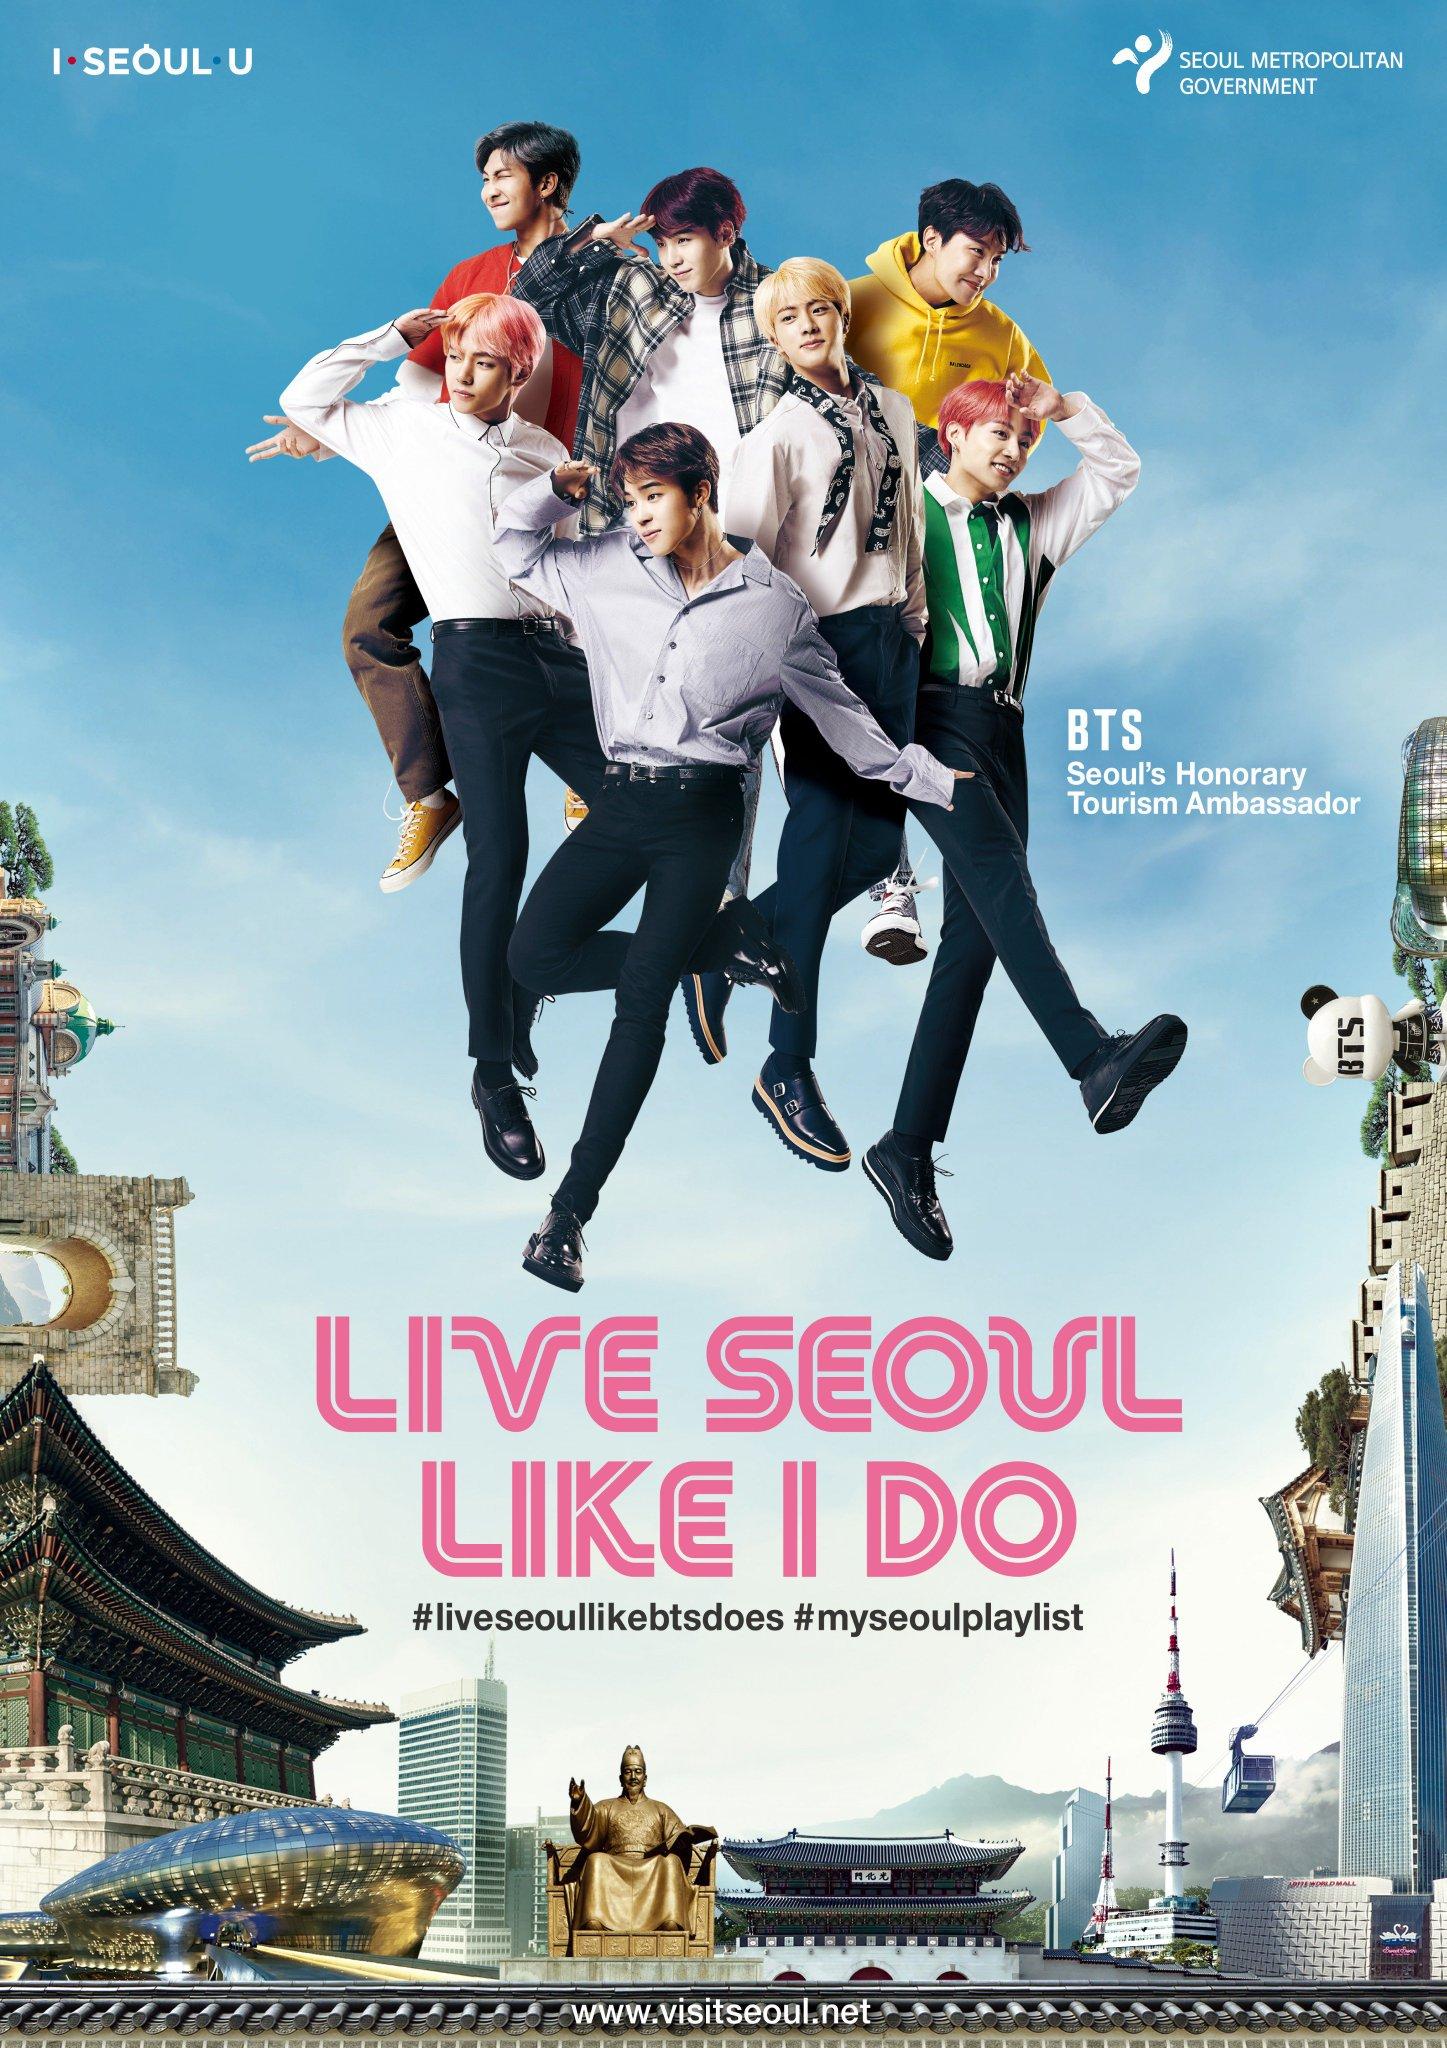 Picture Bts Live Seoul Like I Do 2018 Seoul City Print Ads